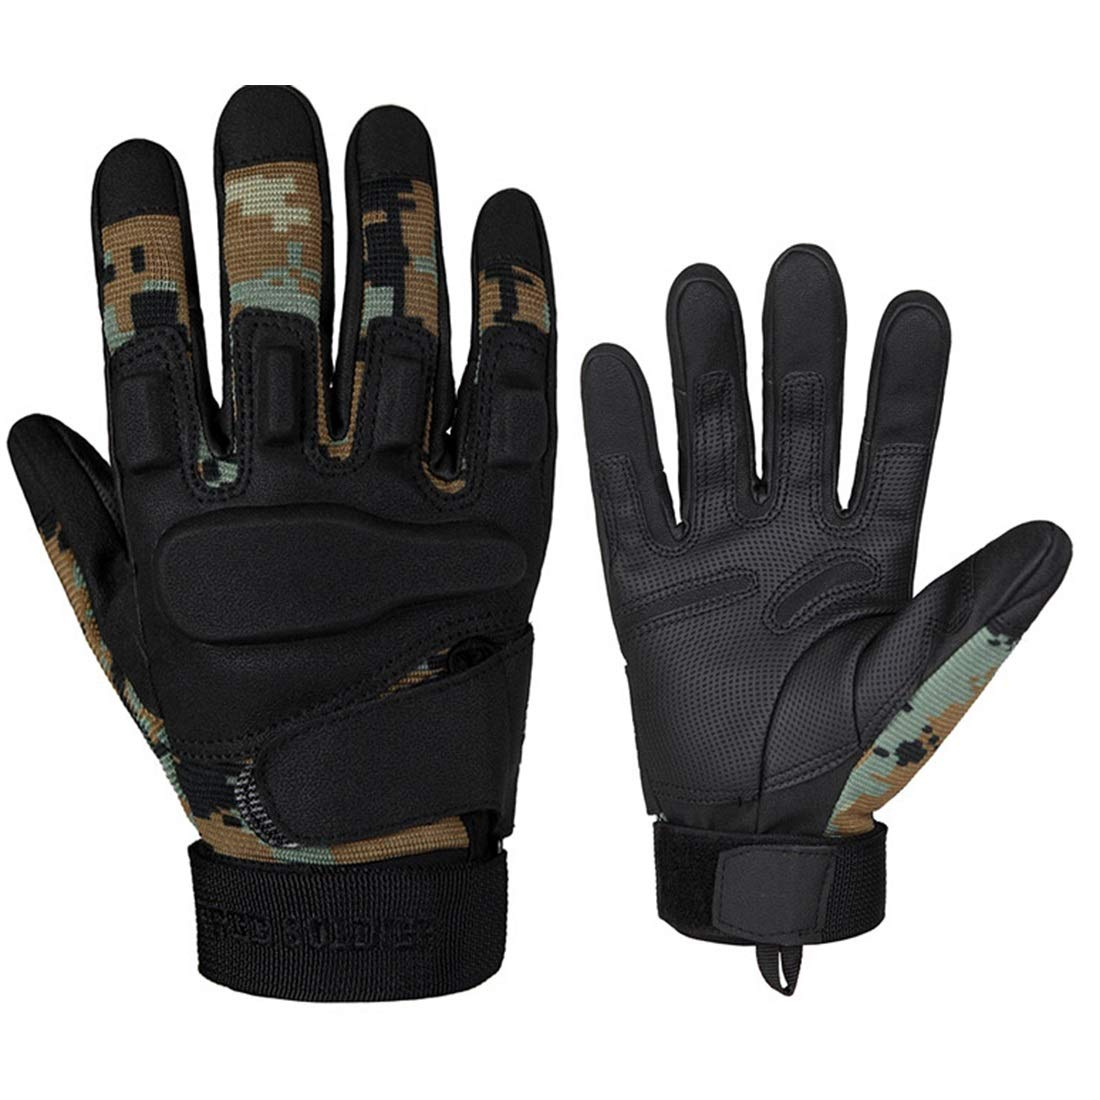 KirinArt schwarz Hawk Hell Storm Tactical Handschuhe schwarz Hawk Army Fan Vollfinger-Handschuhe